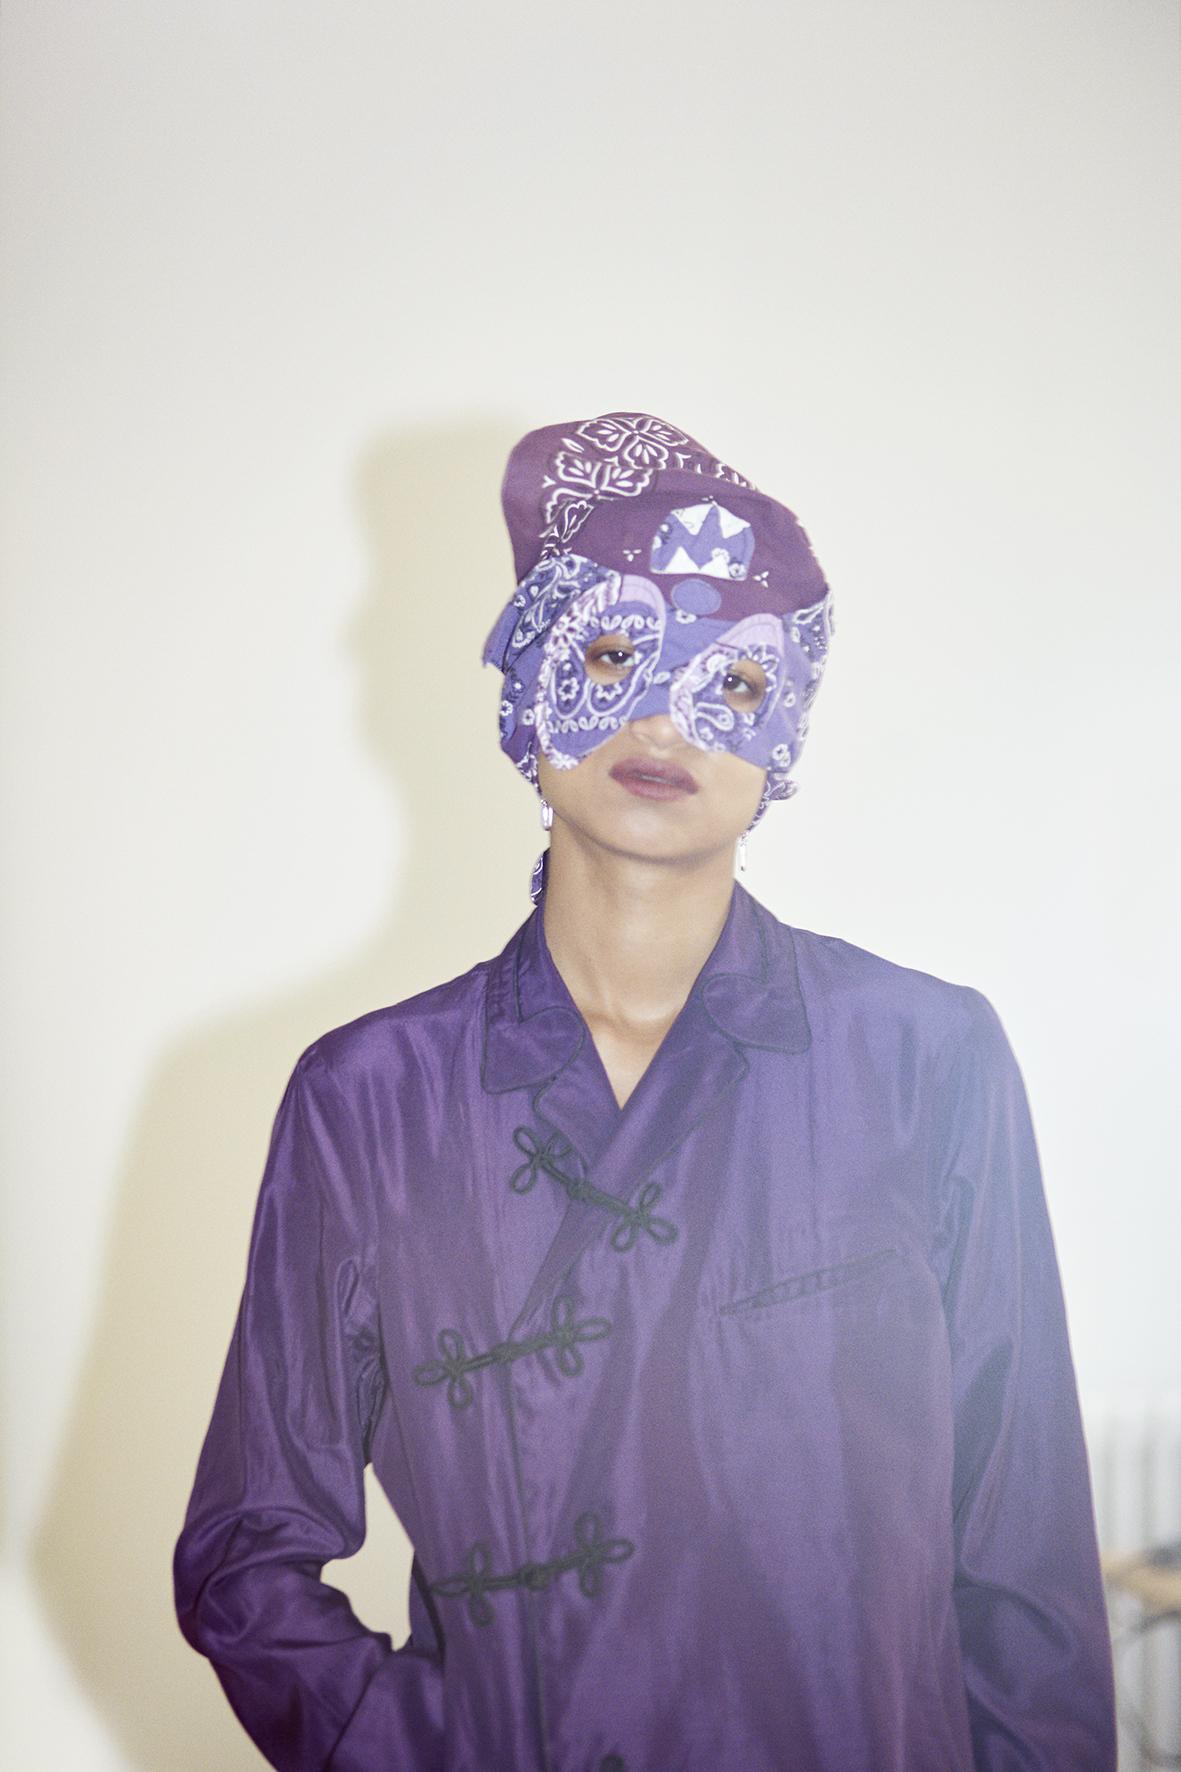 Pajama croise shirt, purple mask bandana. Hand-cut crystals silver earrings EDDIE BORGO